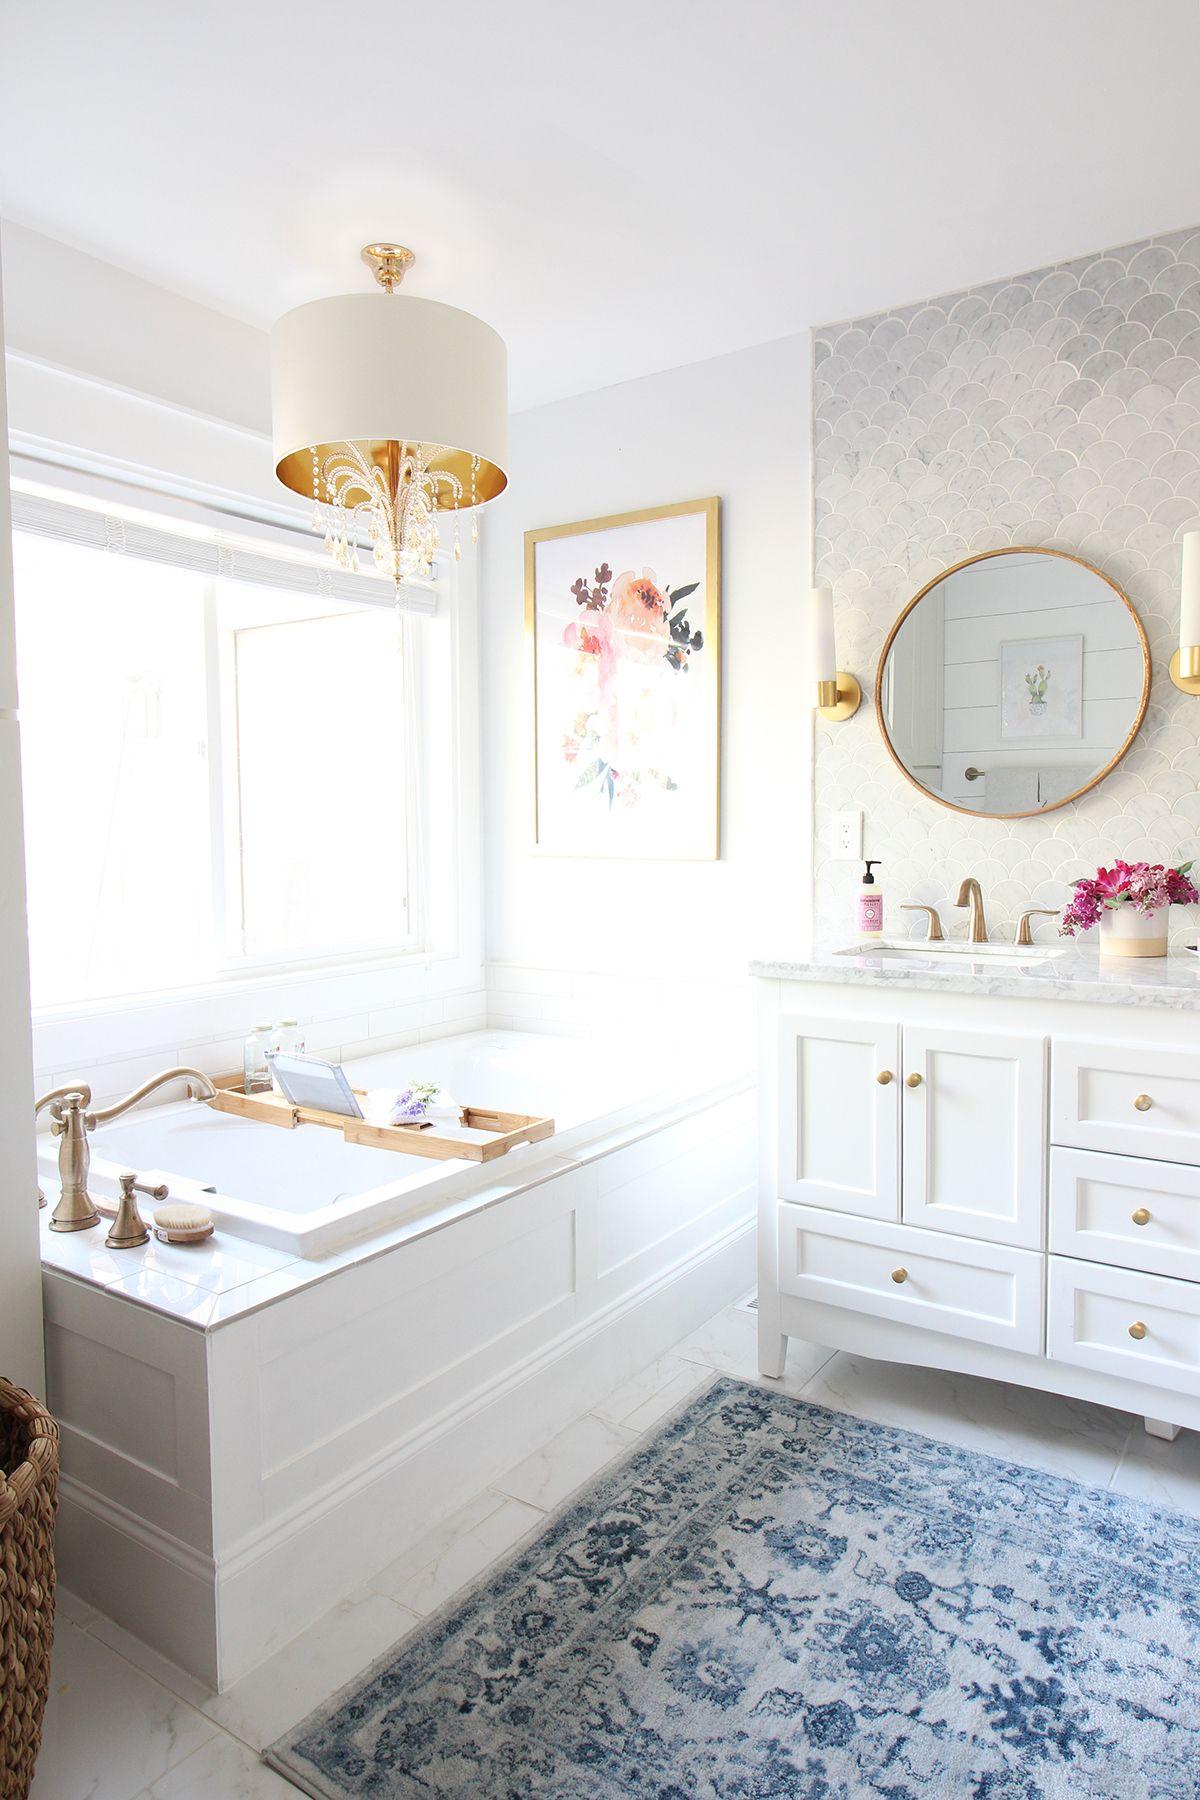 Explore Very Small Bathroom, Feminine Bathroom, And More! Part 59